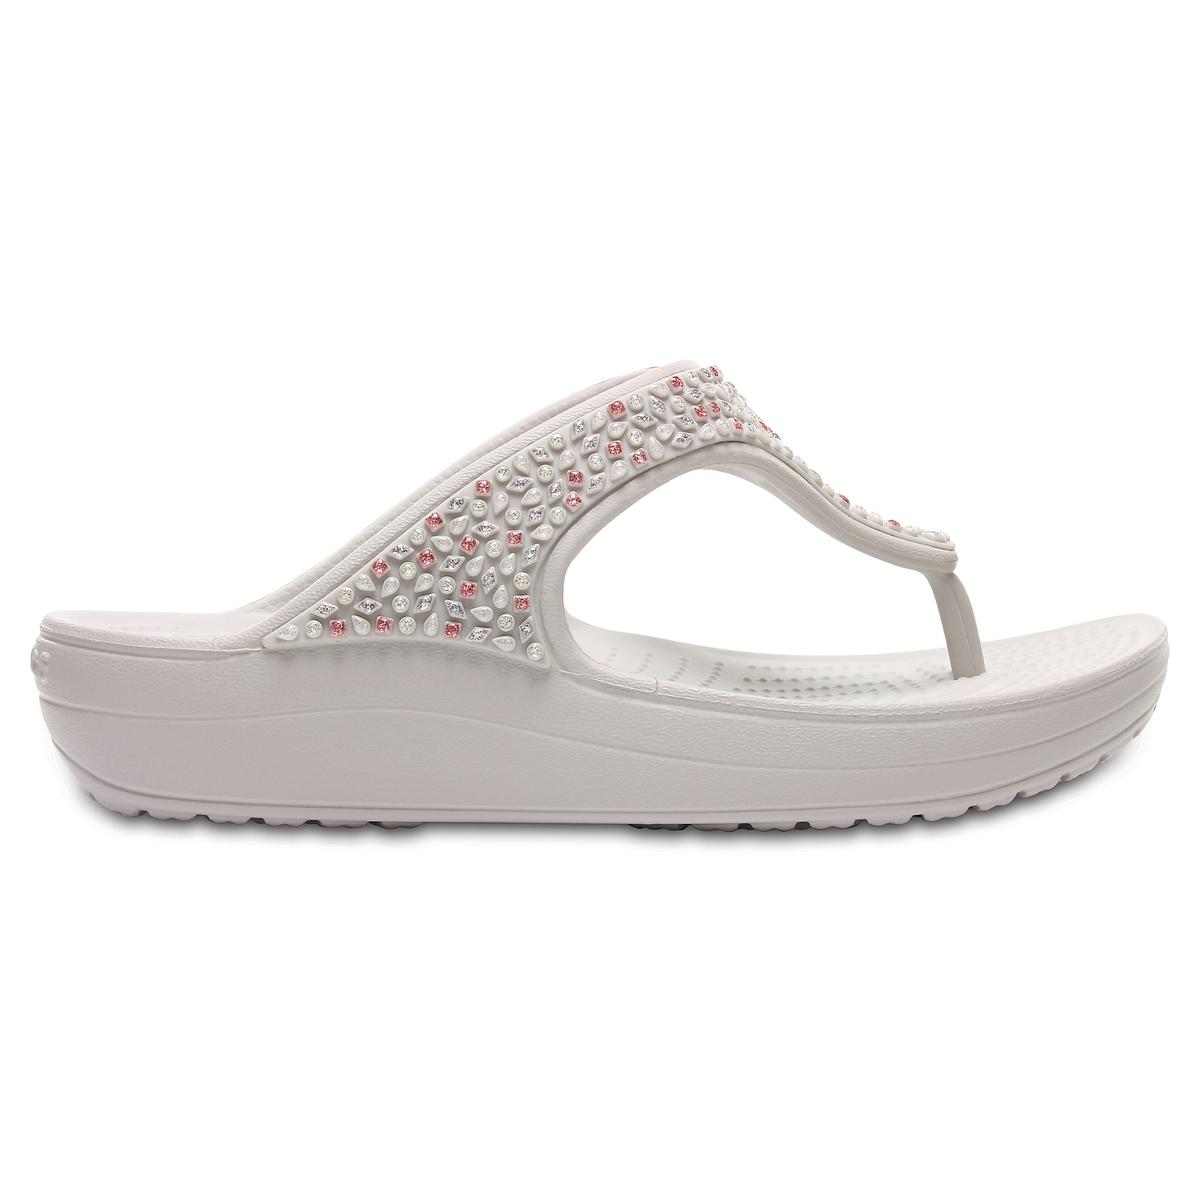 Туфли без задника из синтетики туфли сабо без задника palmyre